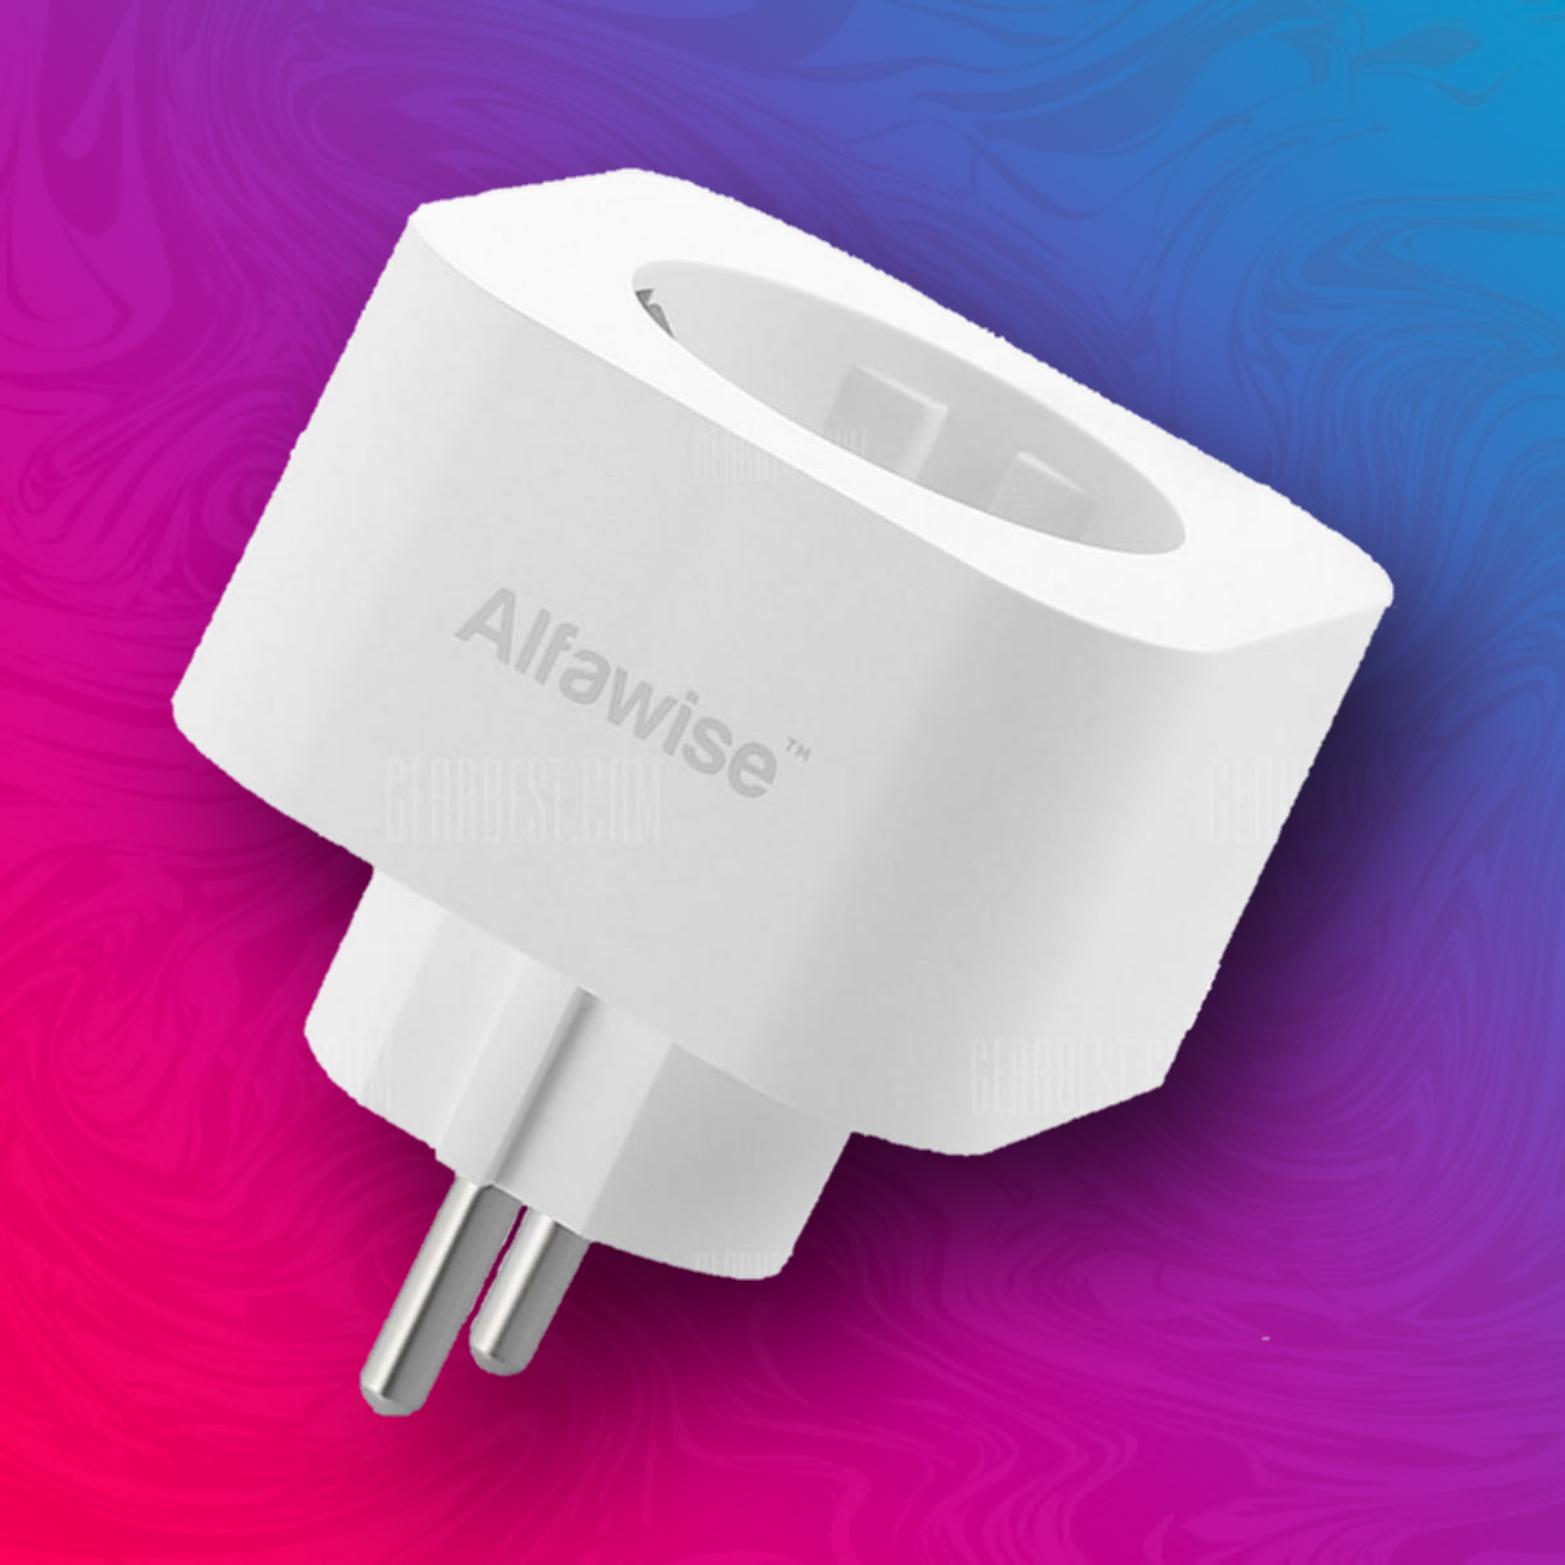 Alfawise PE1004T - EU Steckdose - Alexa / Google Home / IFTTT